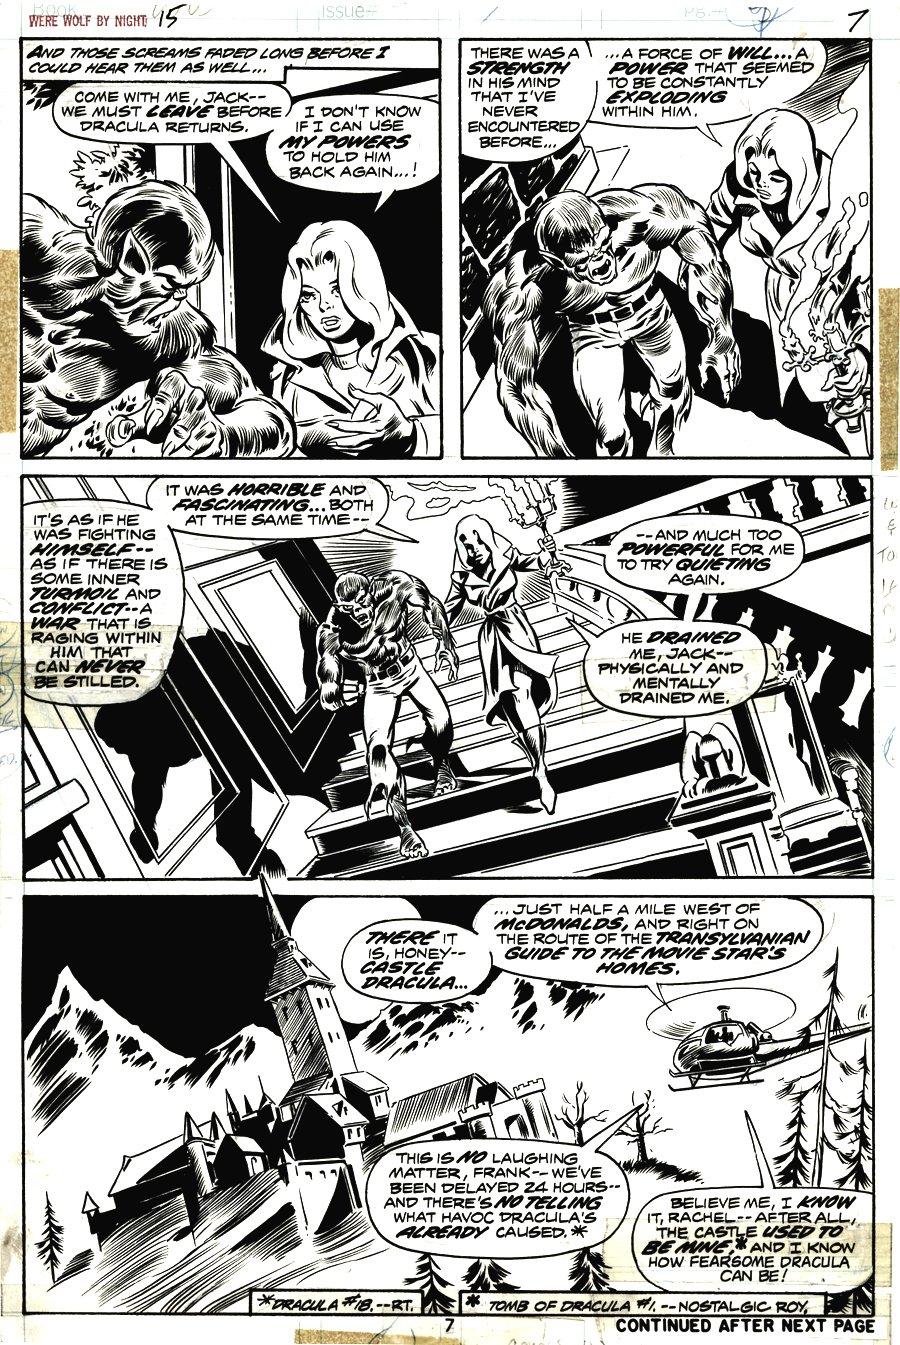 Werewolf by Night #15 p 7 (WEREWOLF VS DRACULA ISSUE!) 1973